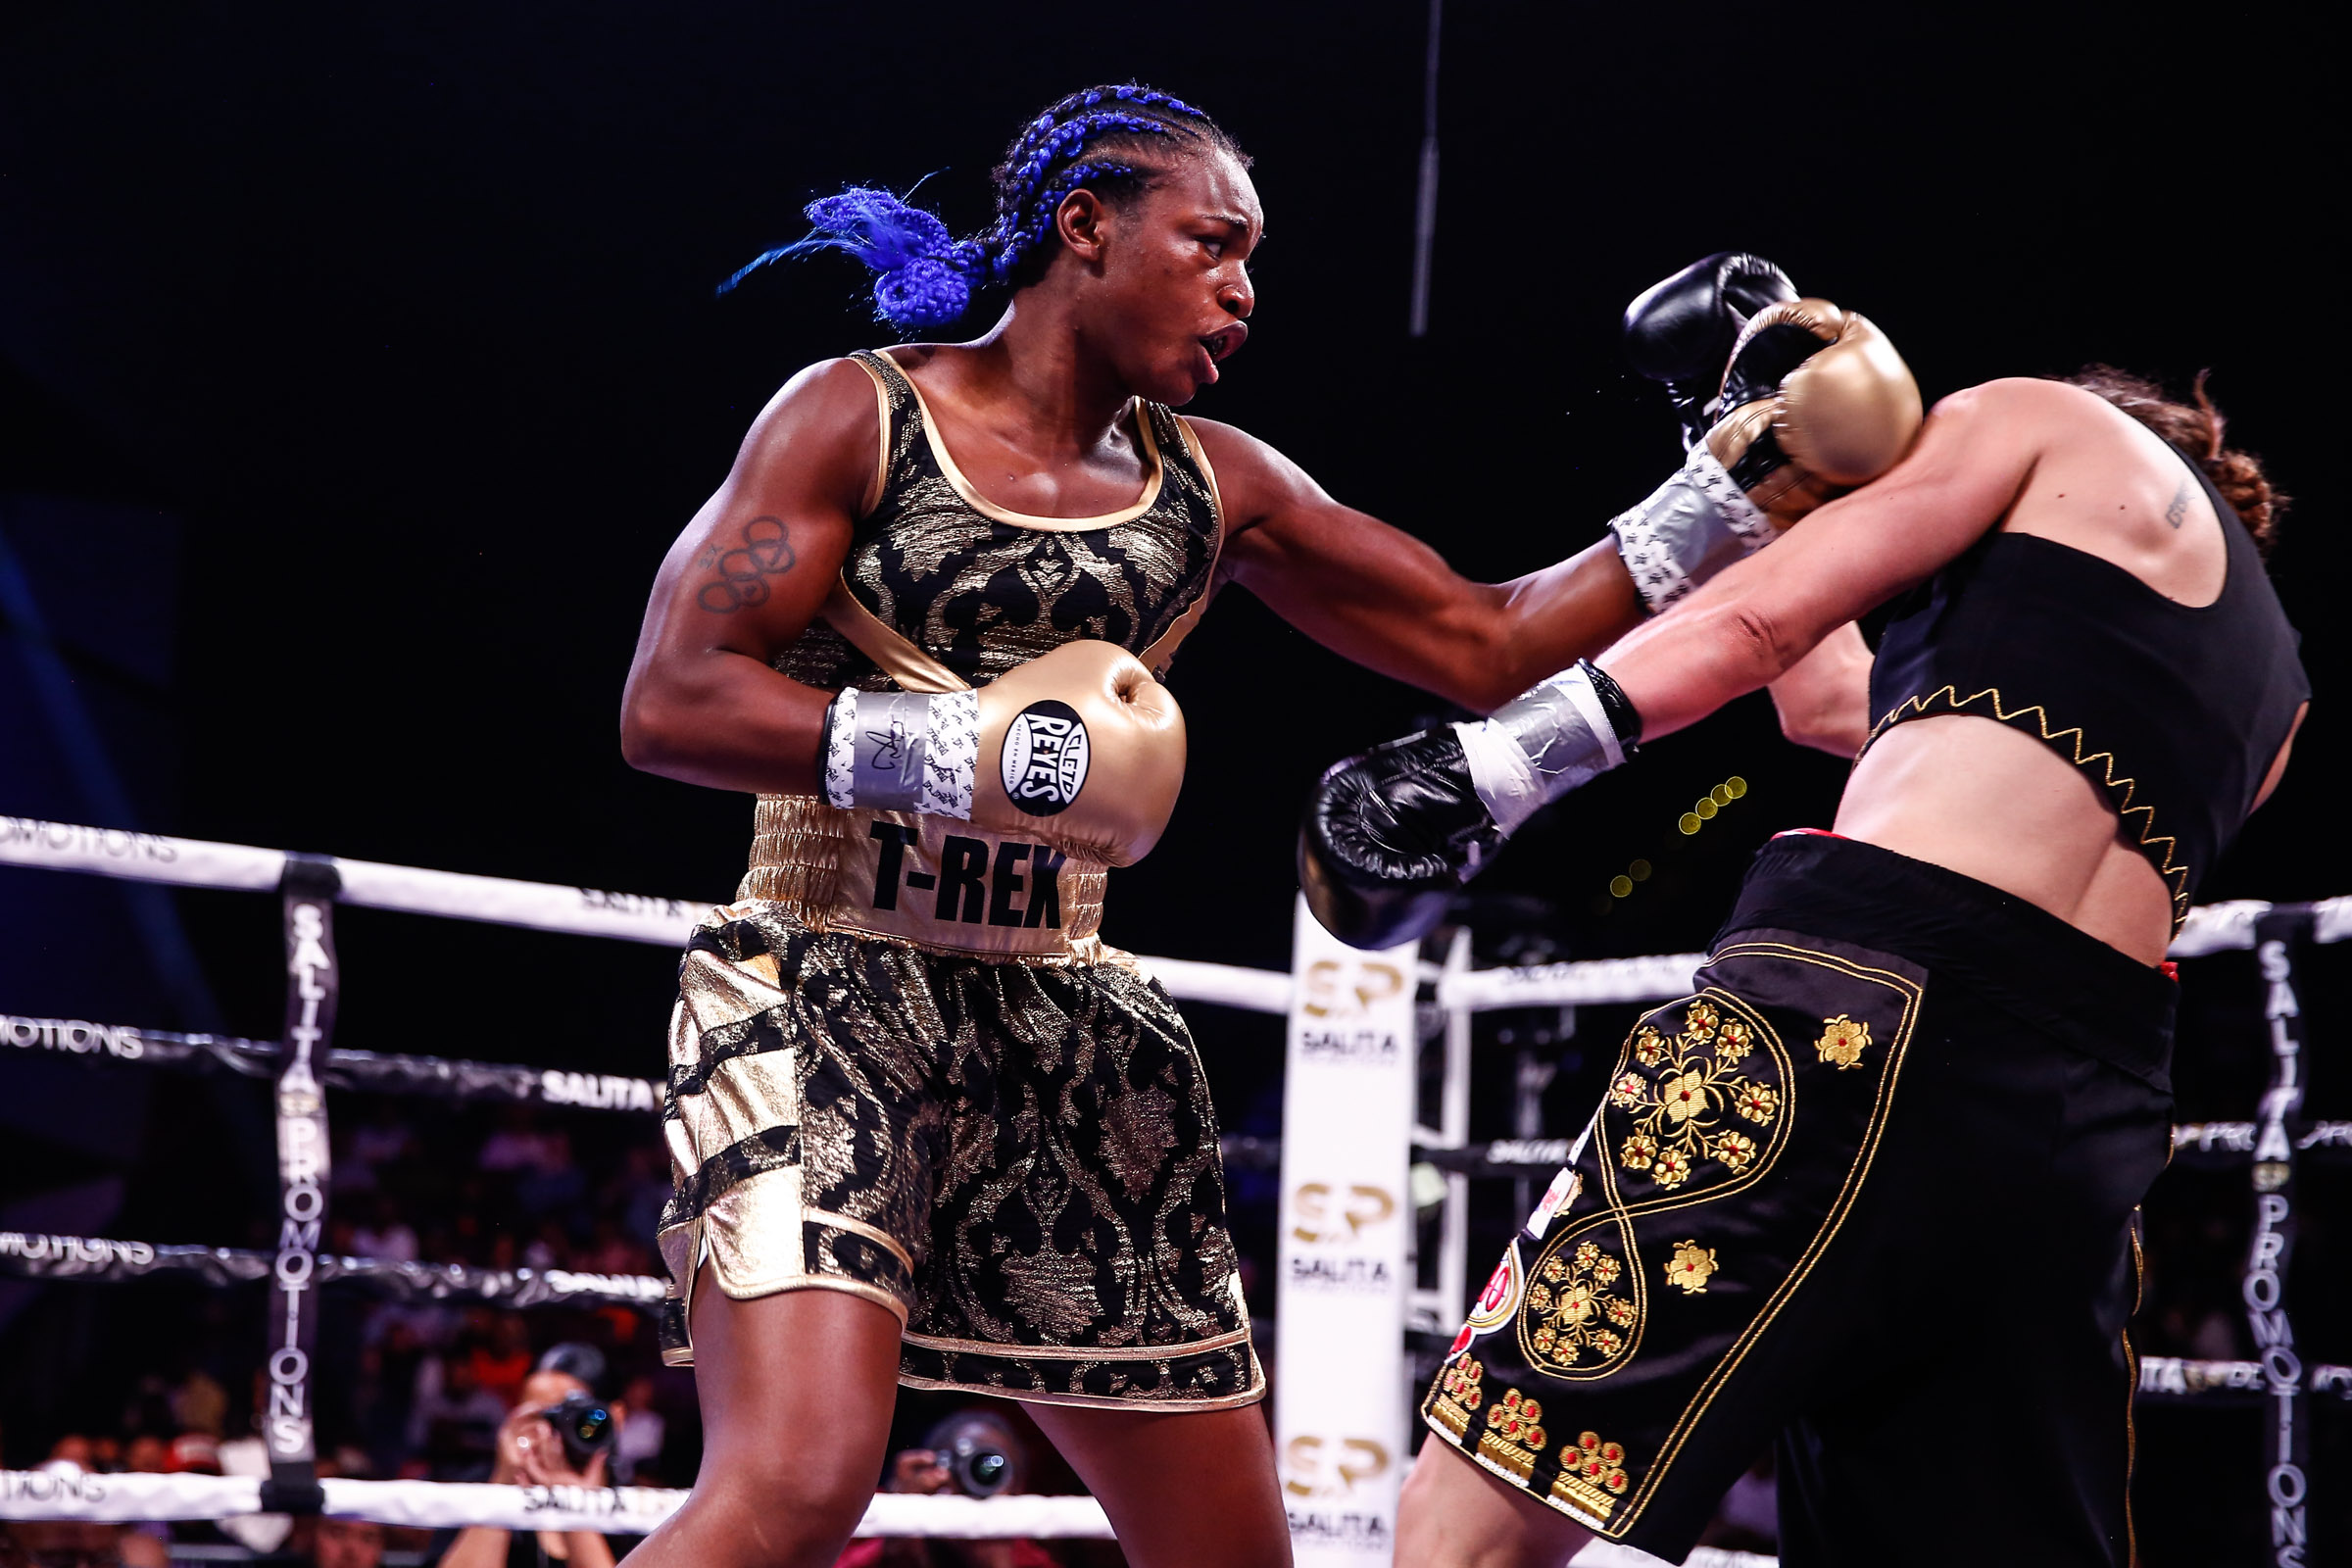 Claressa Shields' (left) jab was very effective against Ivana Habazin. (Photo by Stephanie Trapp/Trappfotos/SHOWTIME)